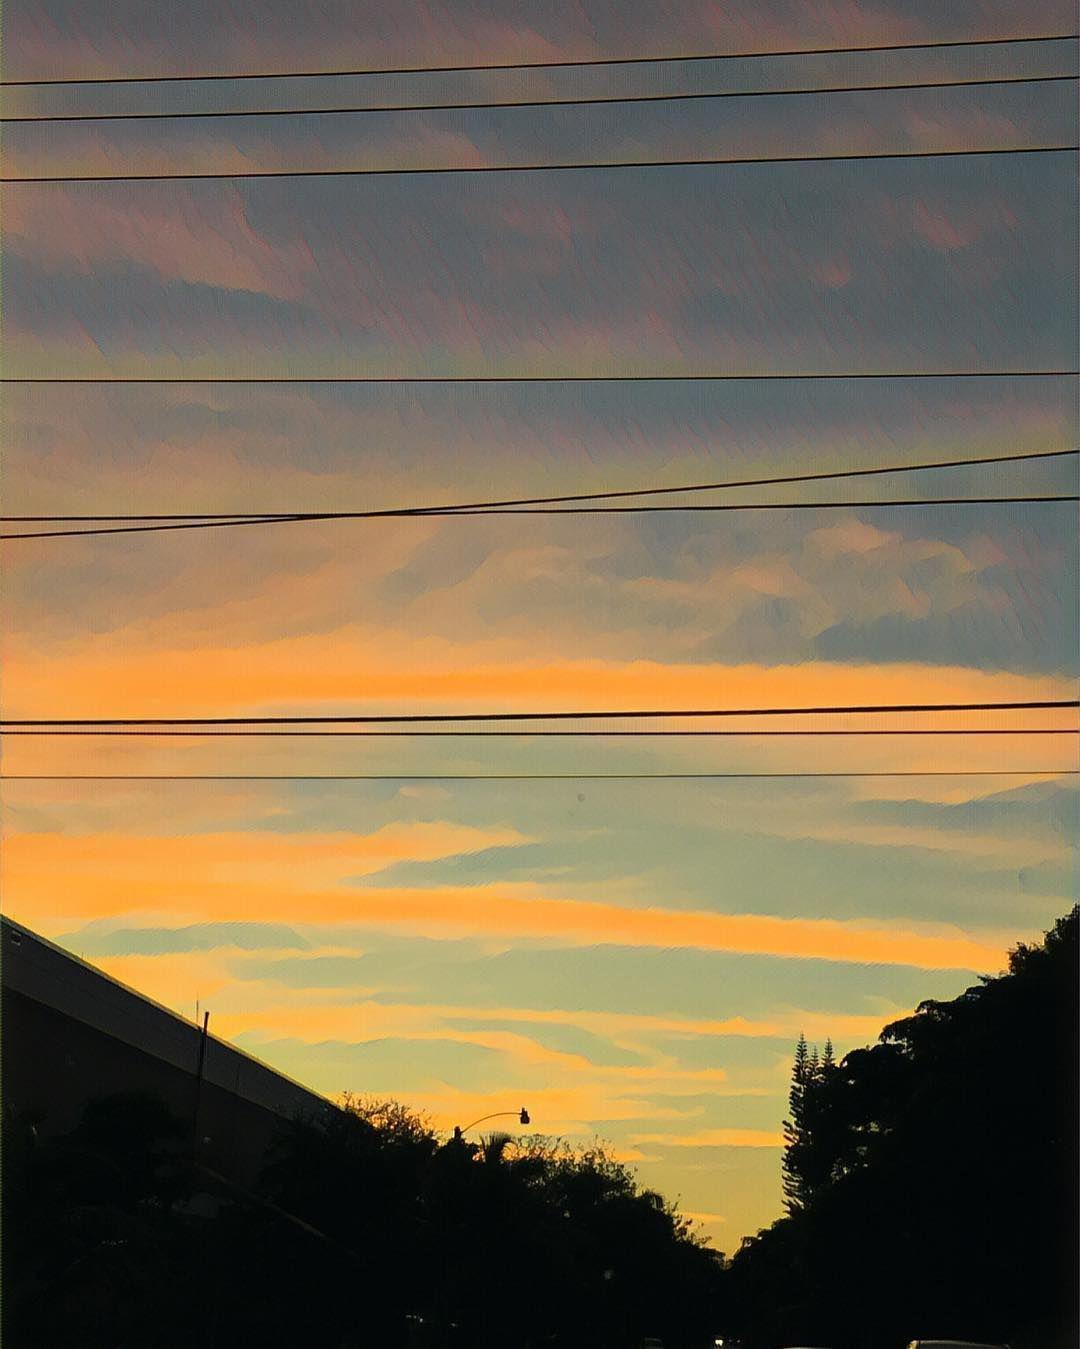 #sunset #nature #naturelovers #stripes #skypainters #patterns #textures #paint #painting #orange #prisma